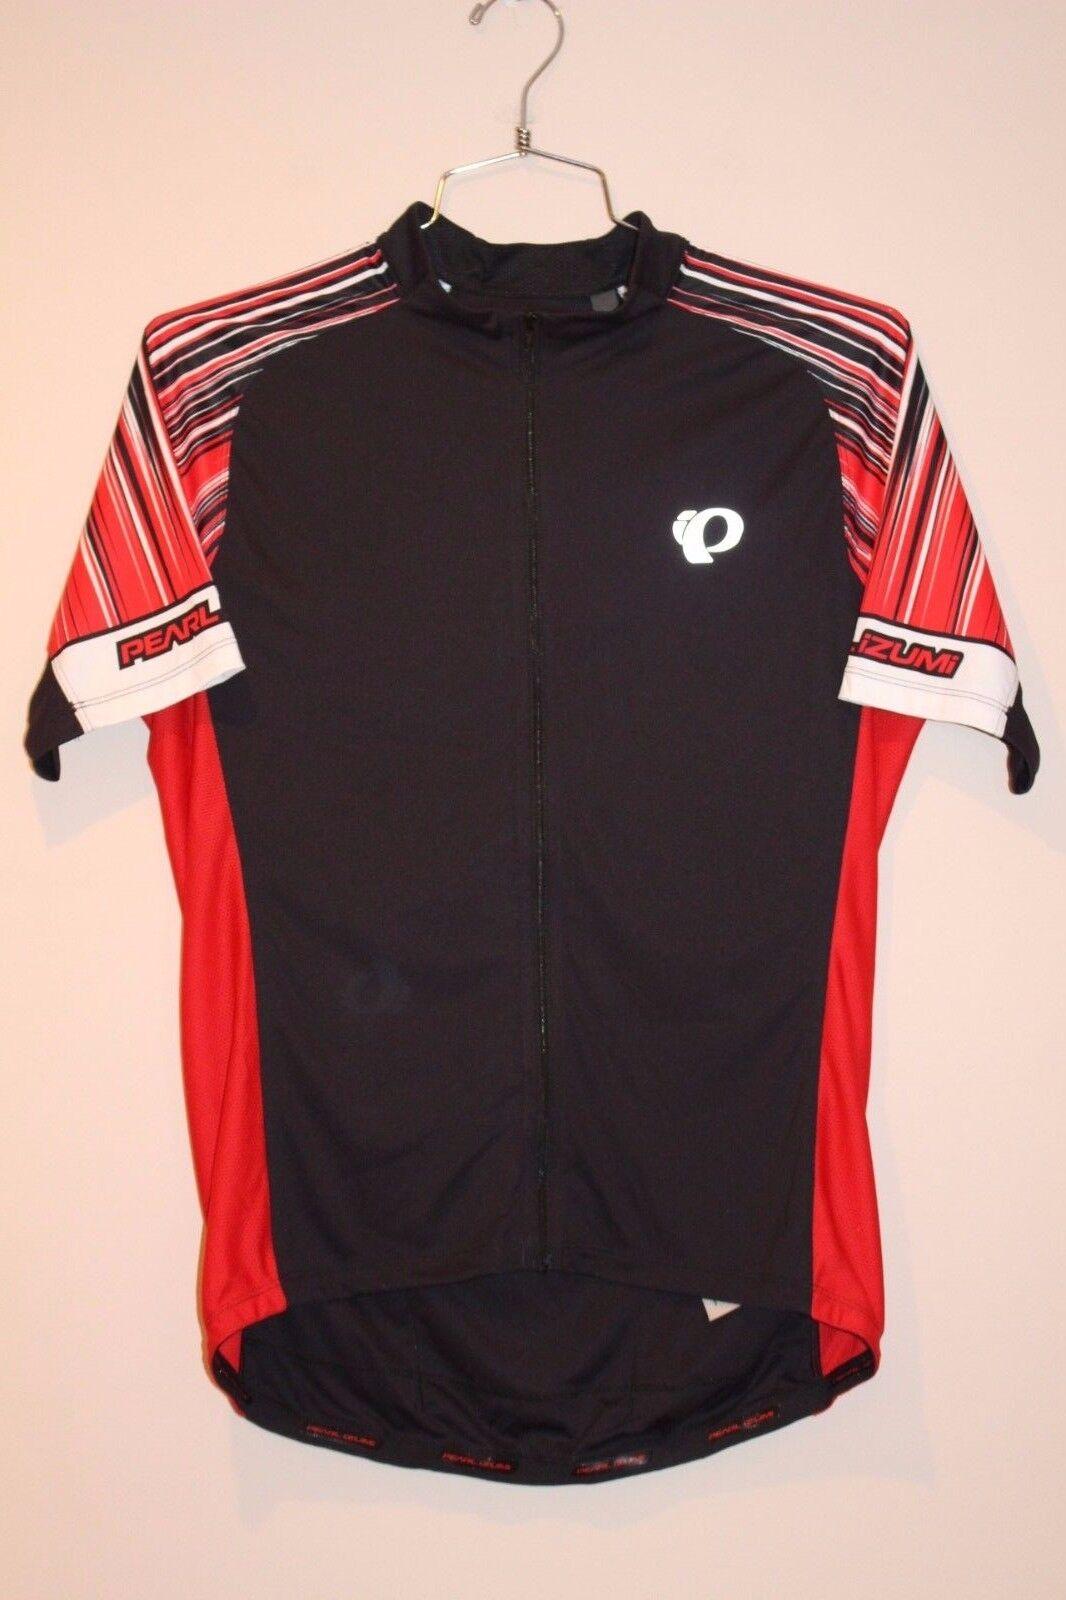 Pearl Izumi Podium Elite Men's Jersey Size XL Red Blk 41121705 NEW